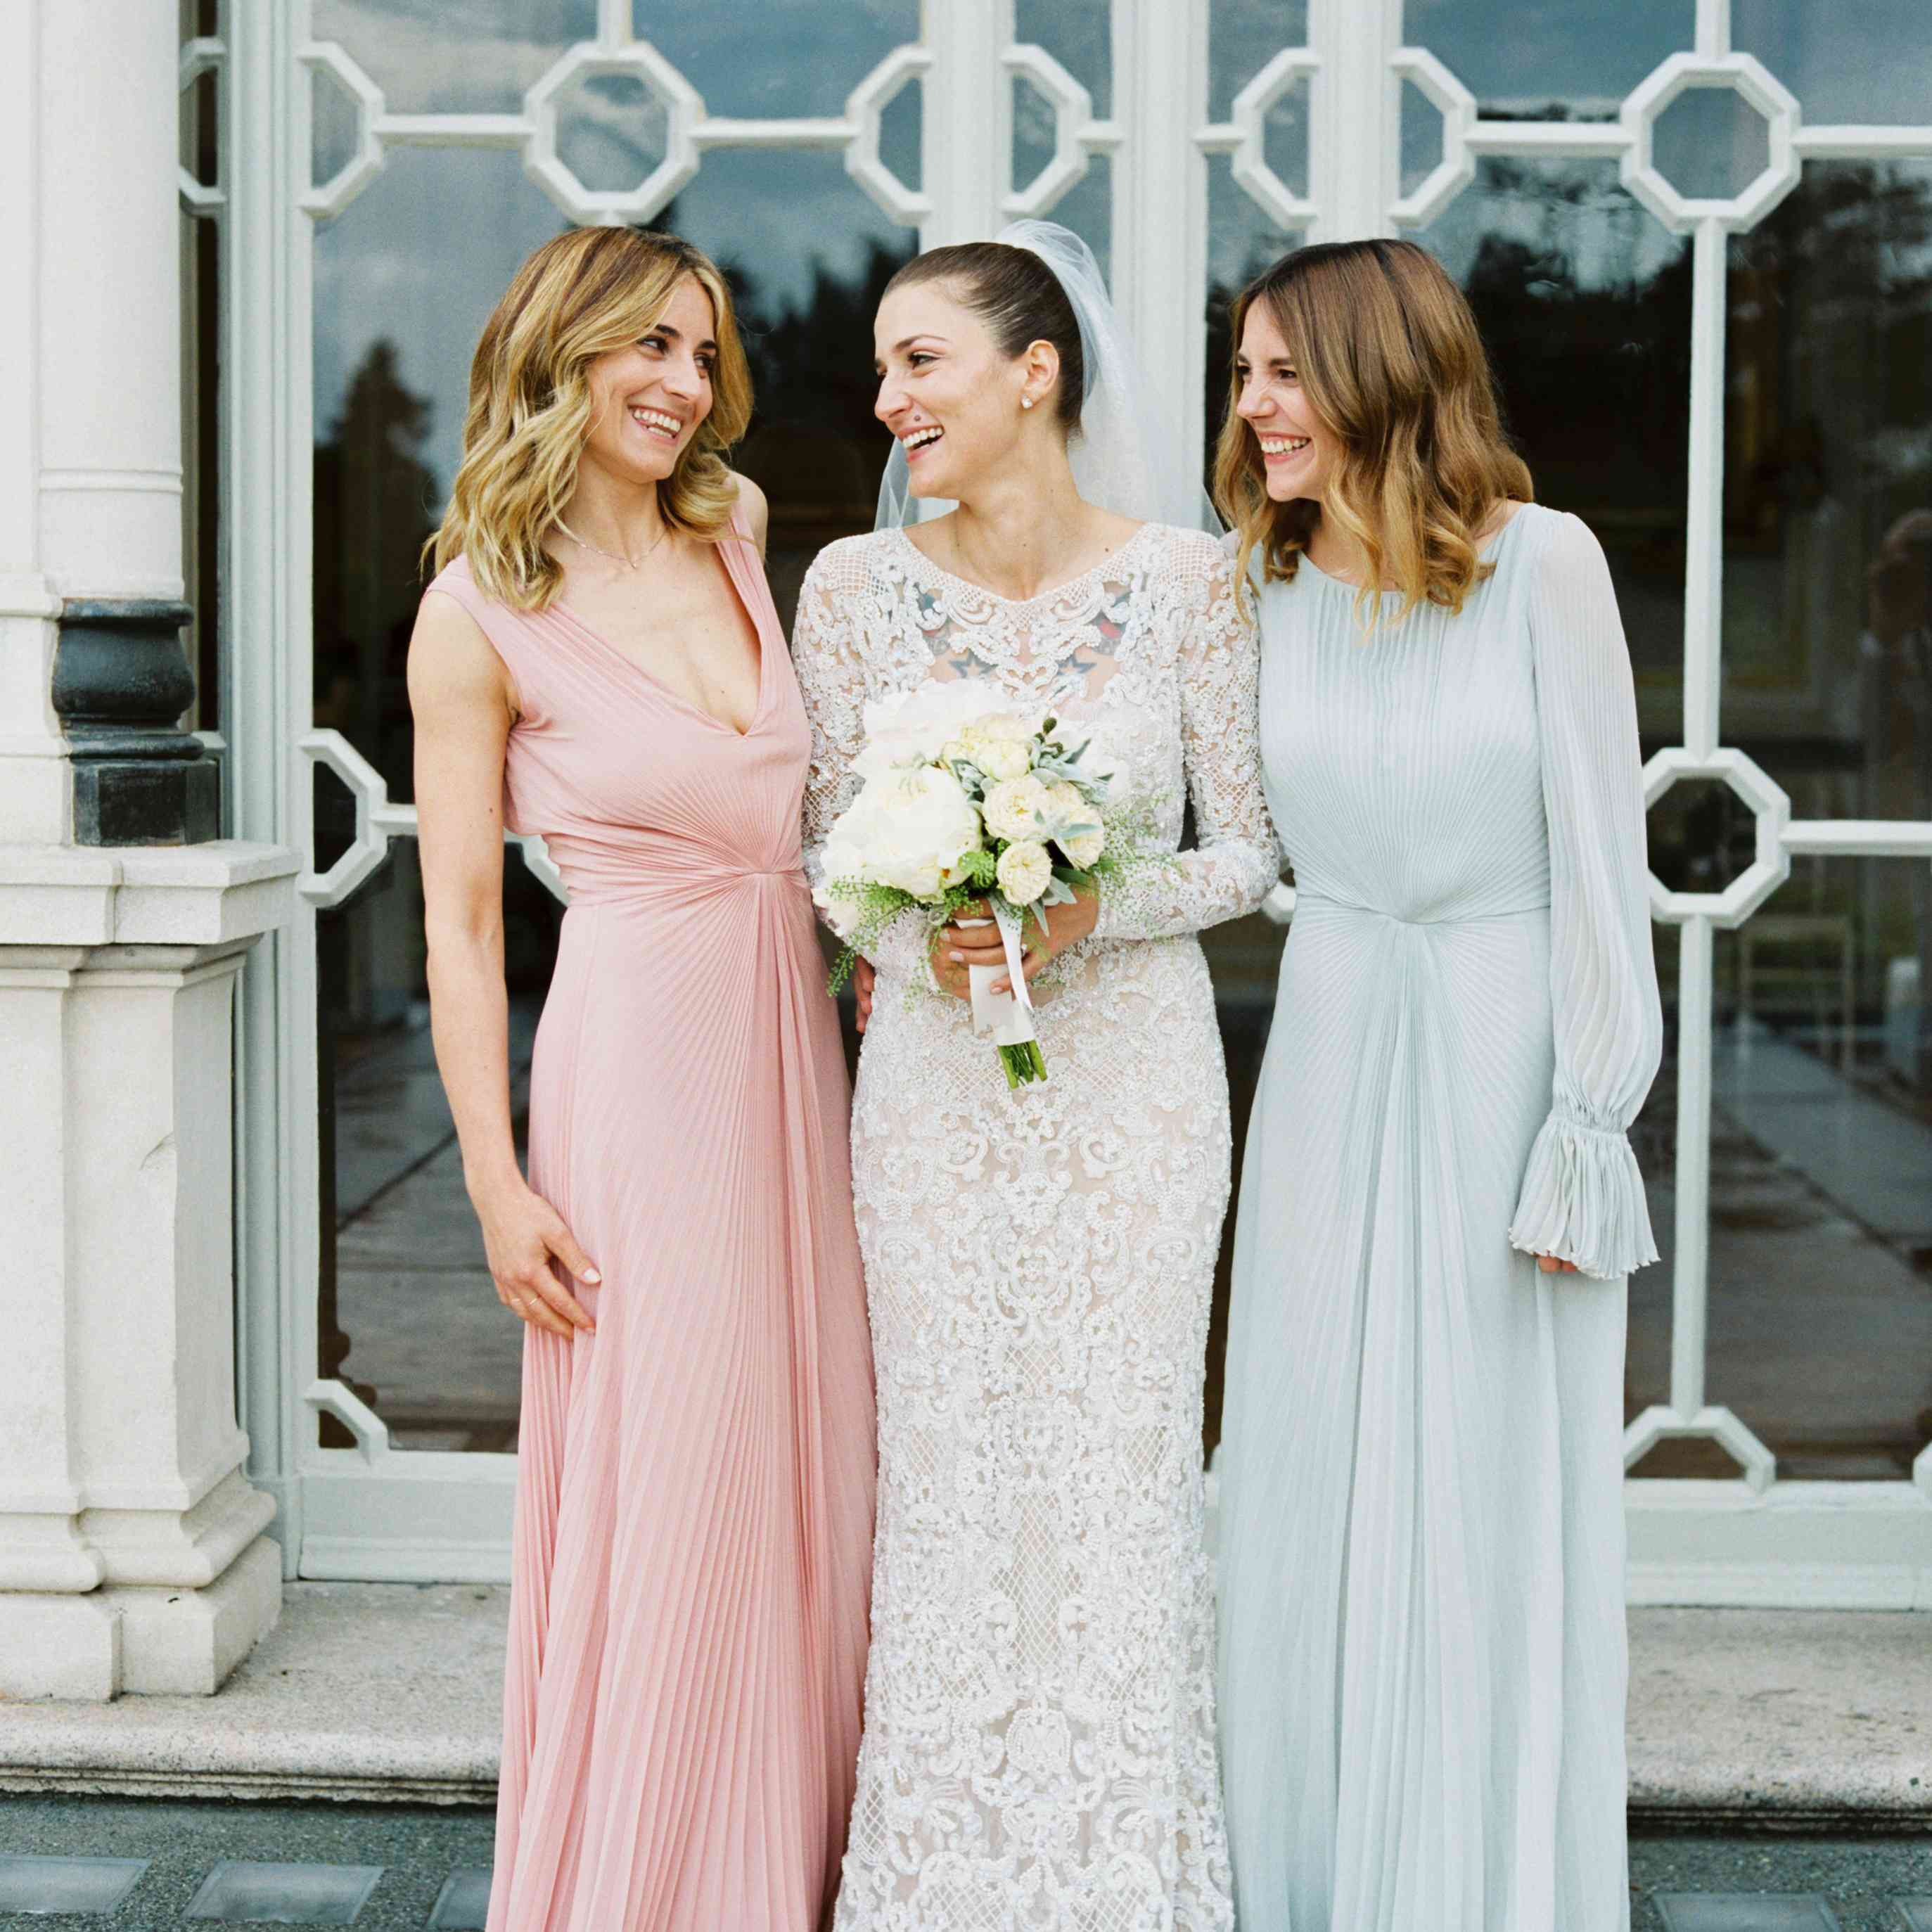 Northern Italian Wedding, Bridesmaids